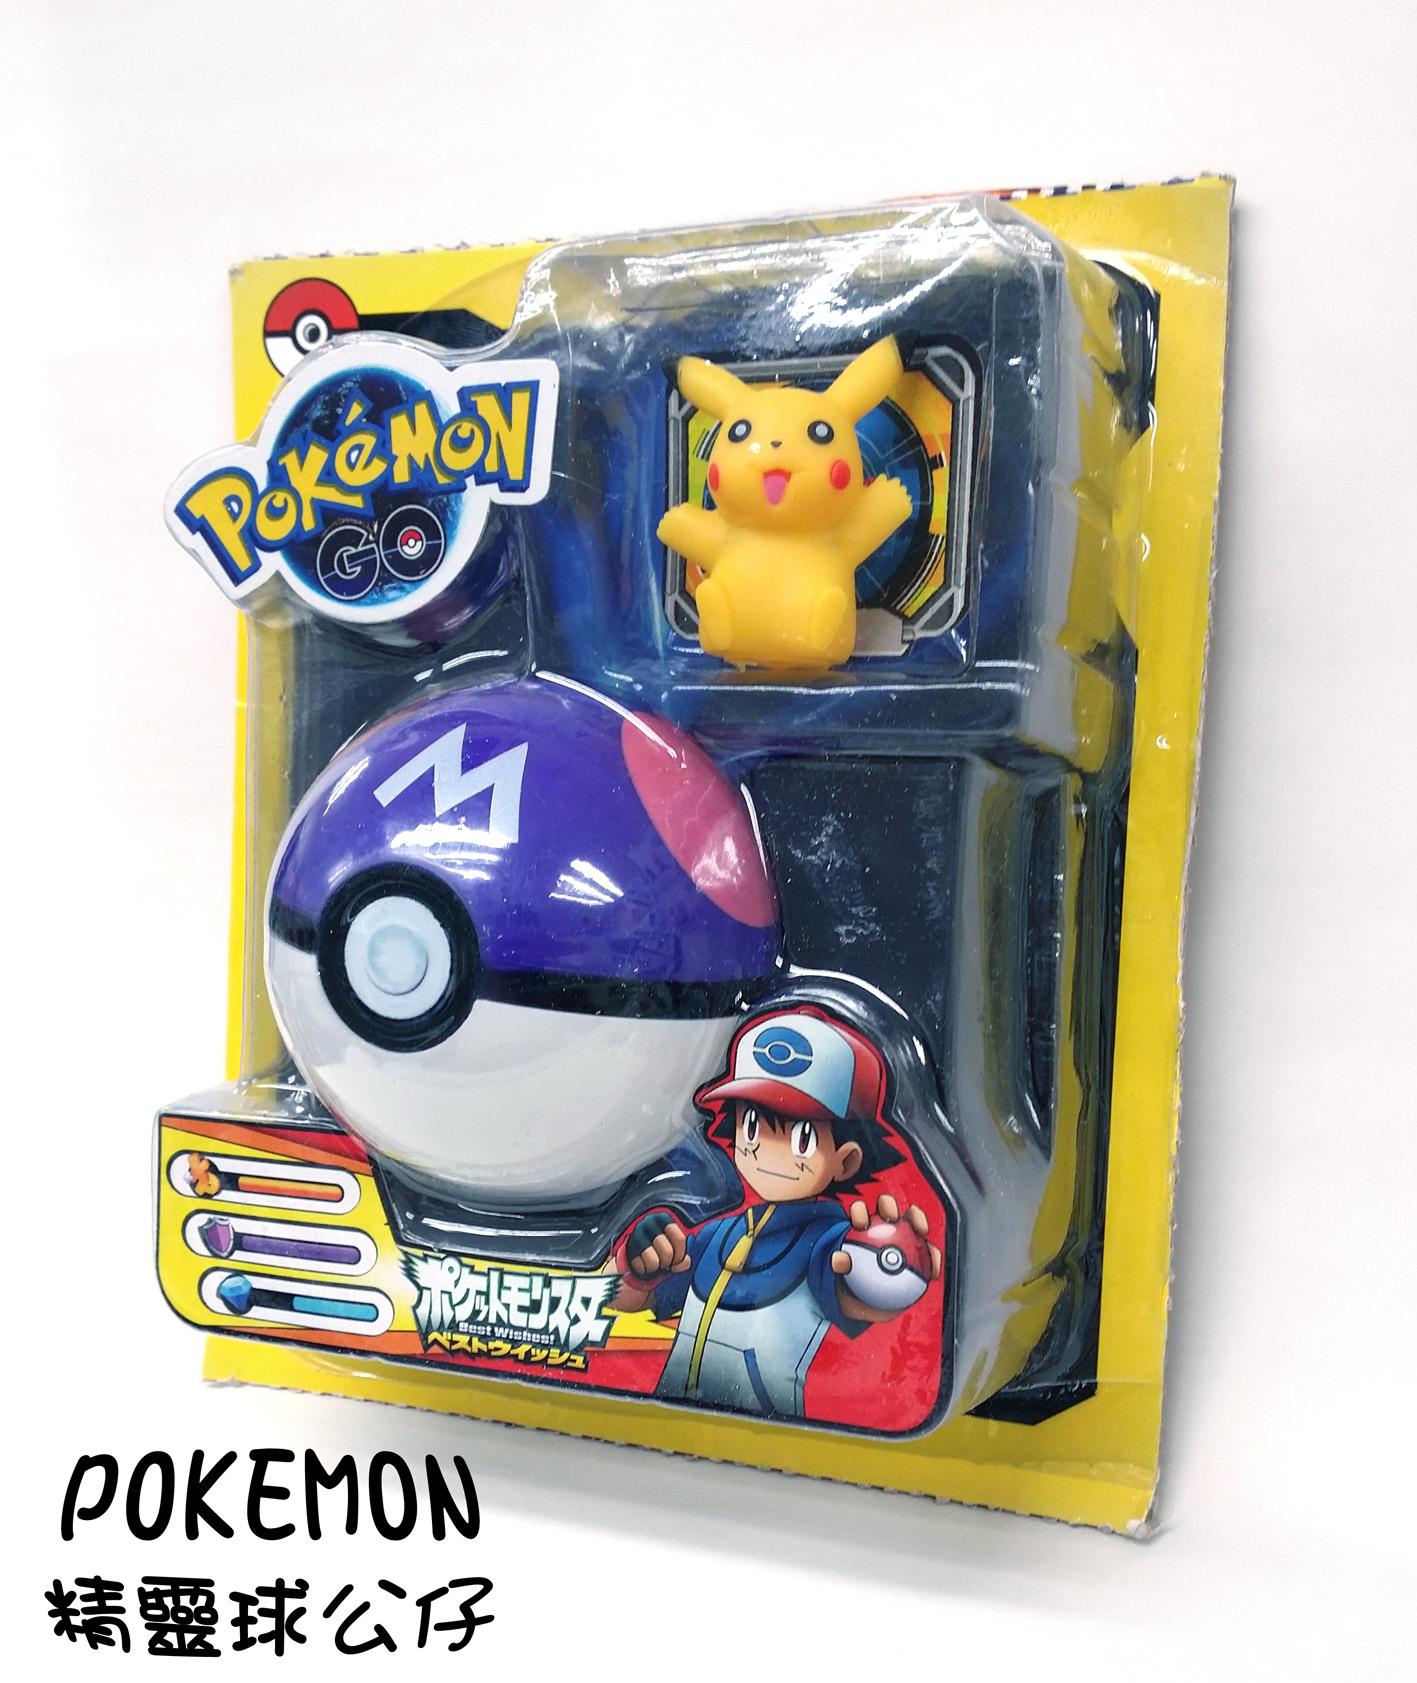 pokemon go 比卡超 pikachu 精靈球